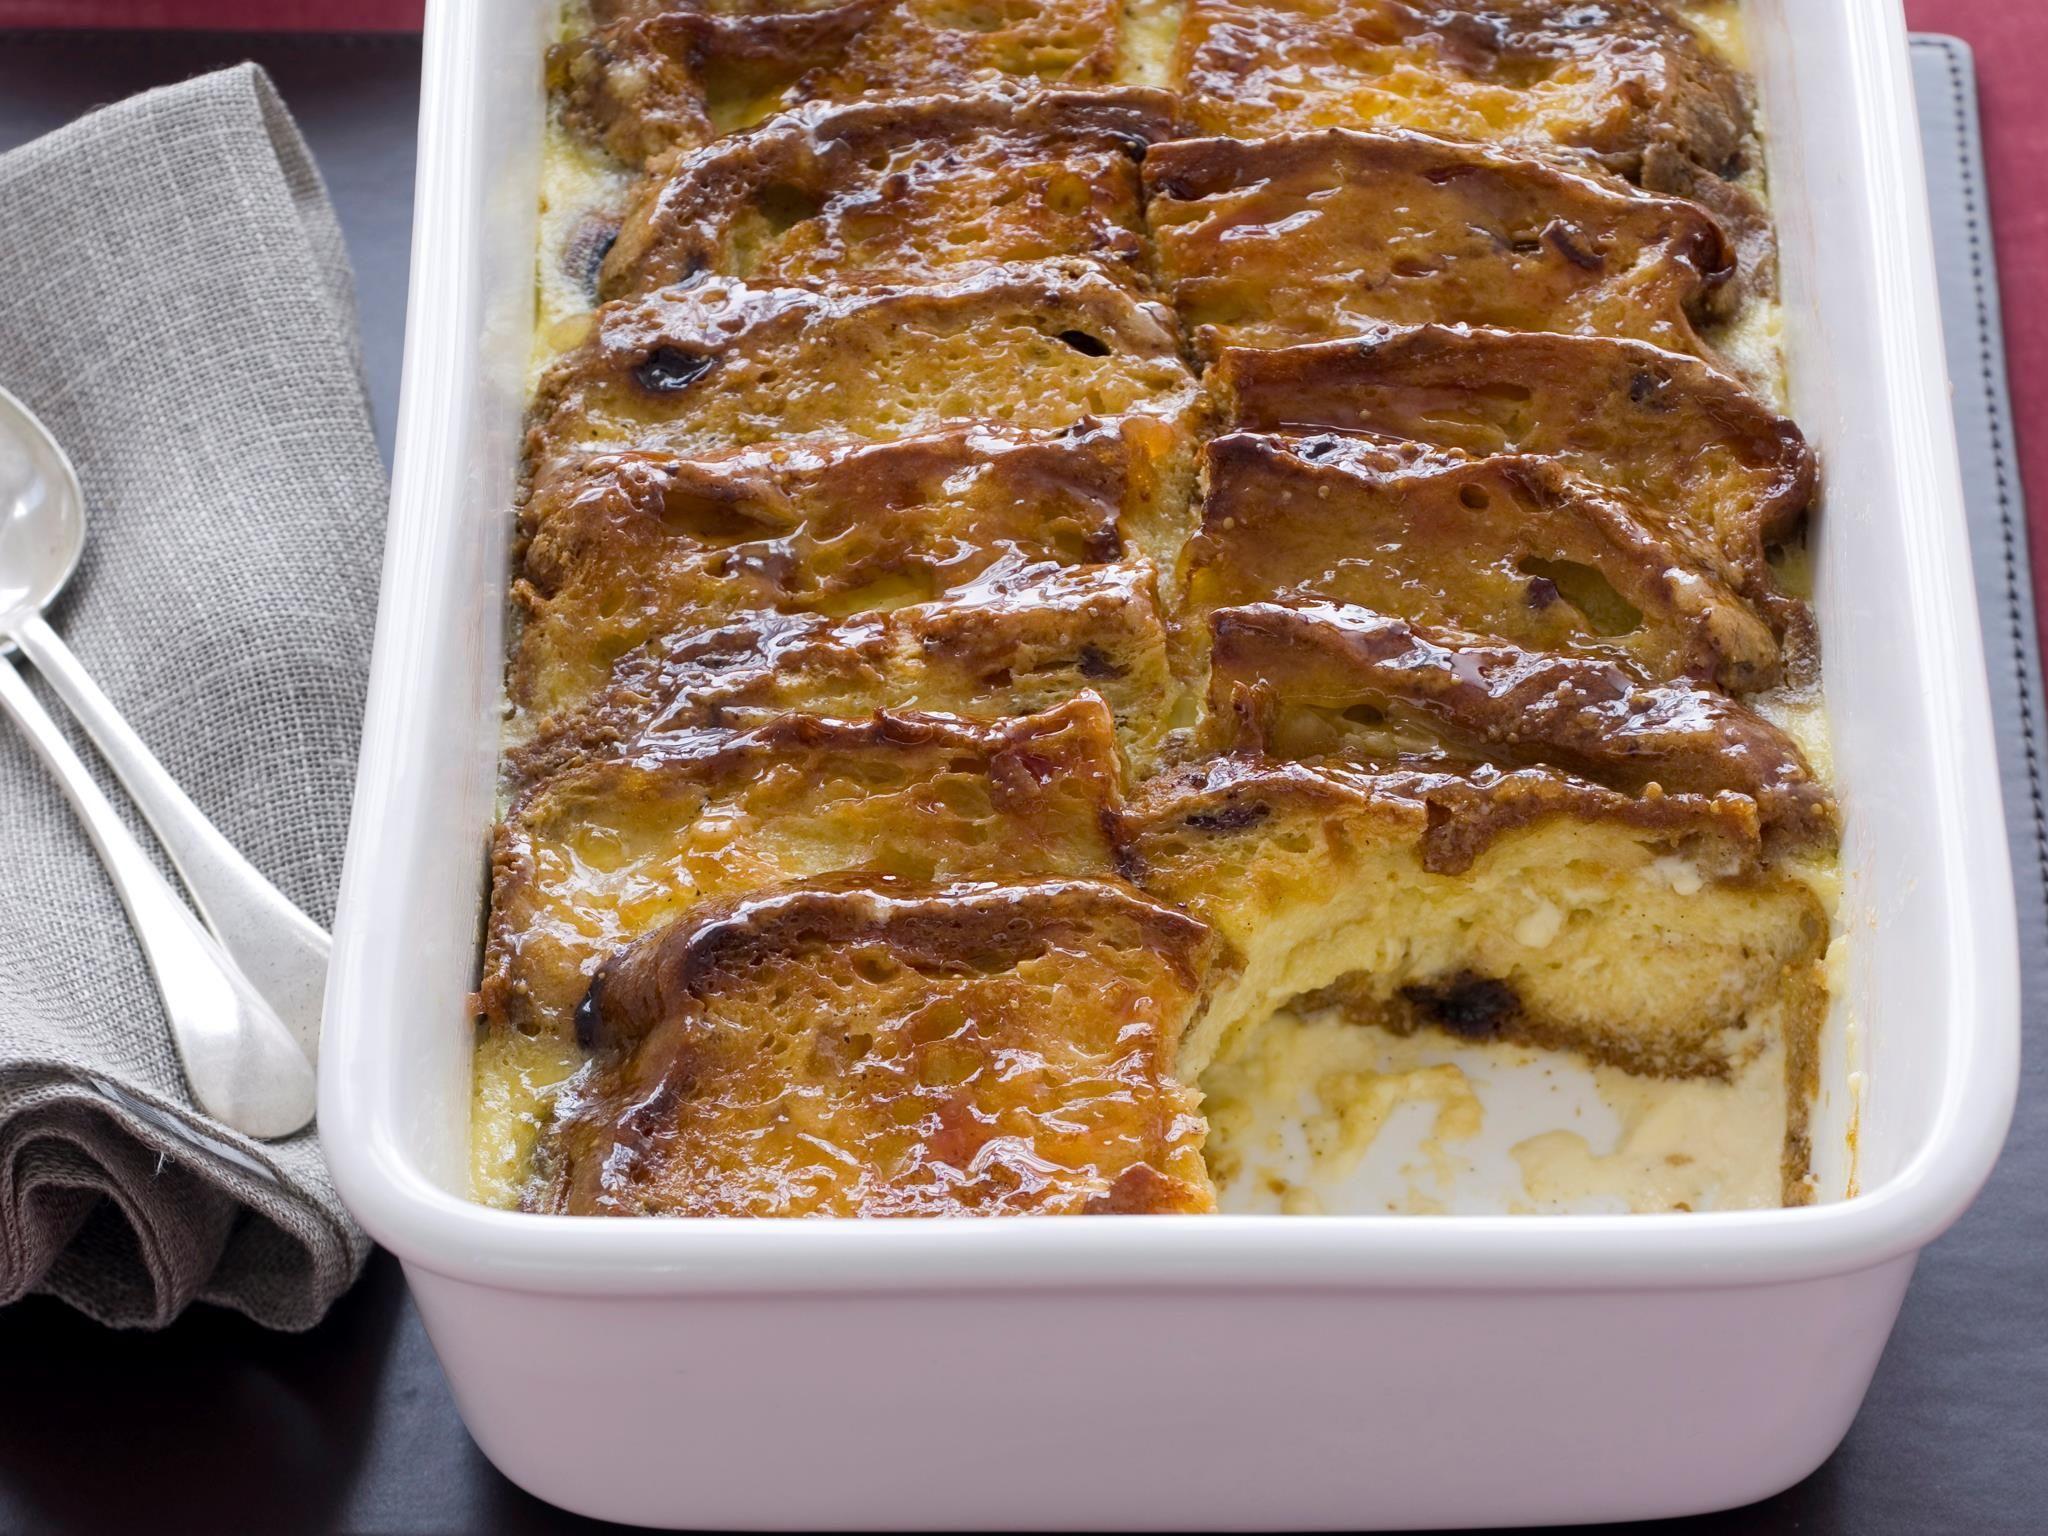 Panettone Bread And Butter Pudding Recipe Bread And Butter Pudding Pudding Recipes Italian Recipes Dessert